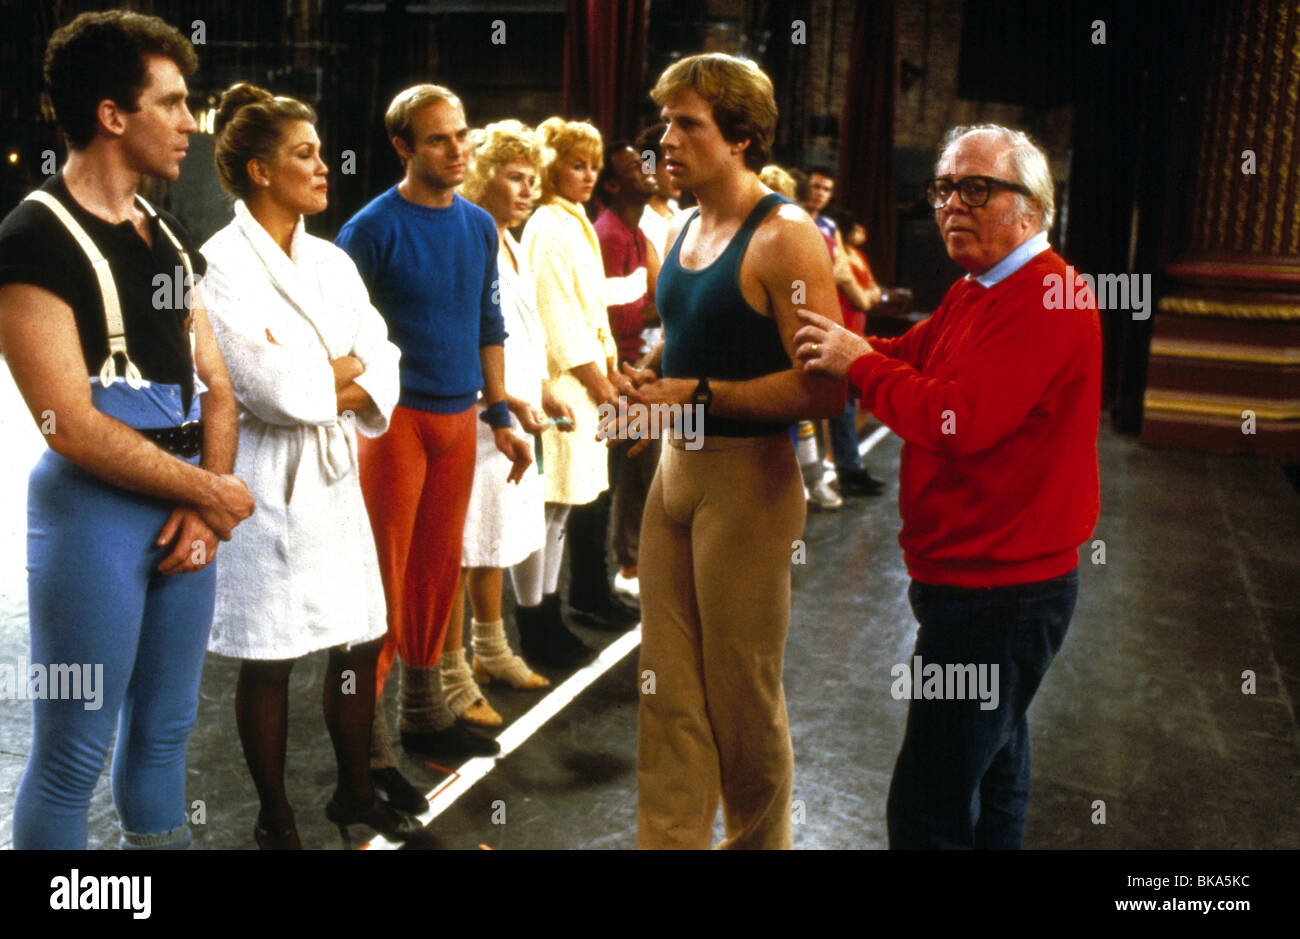 RICHARD ATTENBOROUGH (DIR) O/S 'A CHOROUS LINE' (1985) BLANE SAVAGE RATH 019 - Stock Image